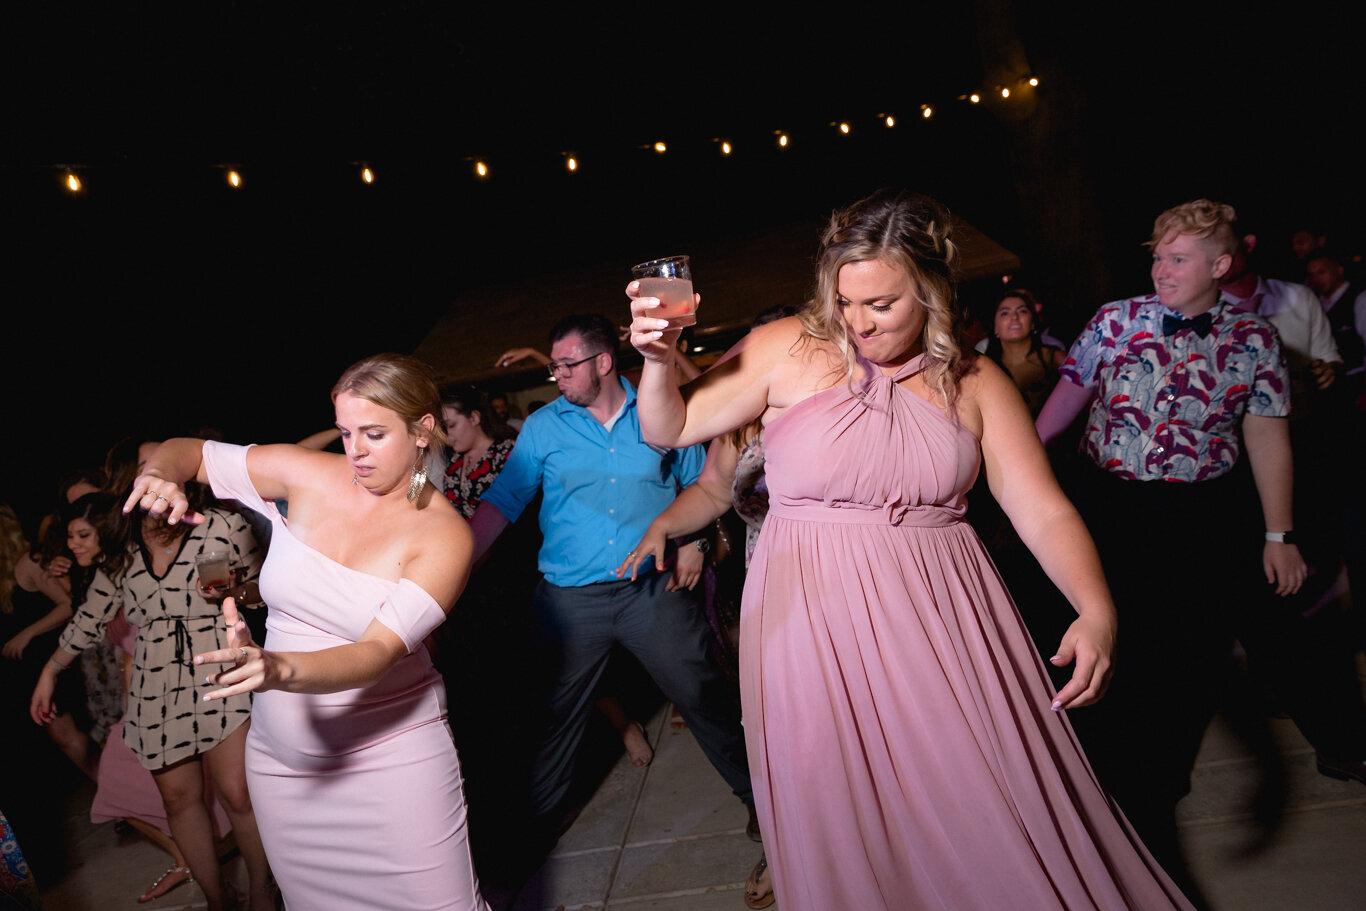 2019.08.24_Emily-Ashir-Wedding-at-the-Maples-6562.jpg